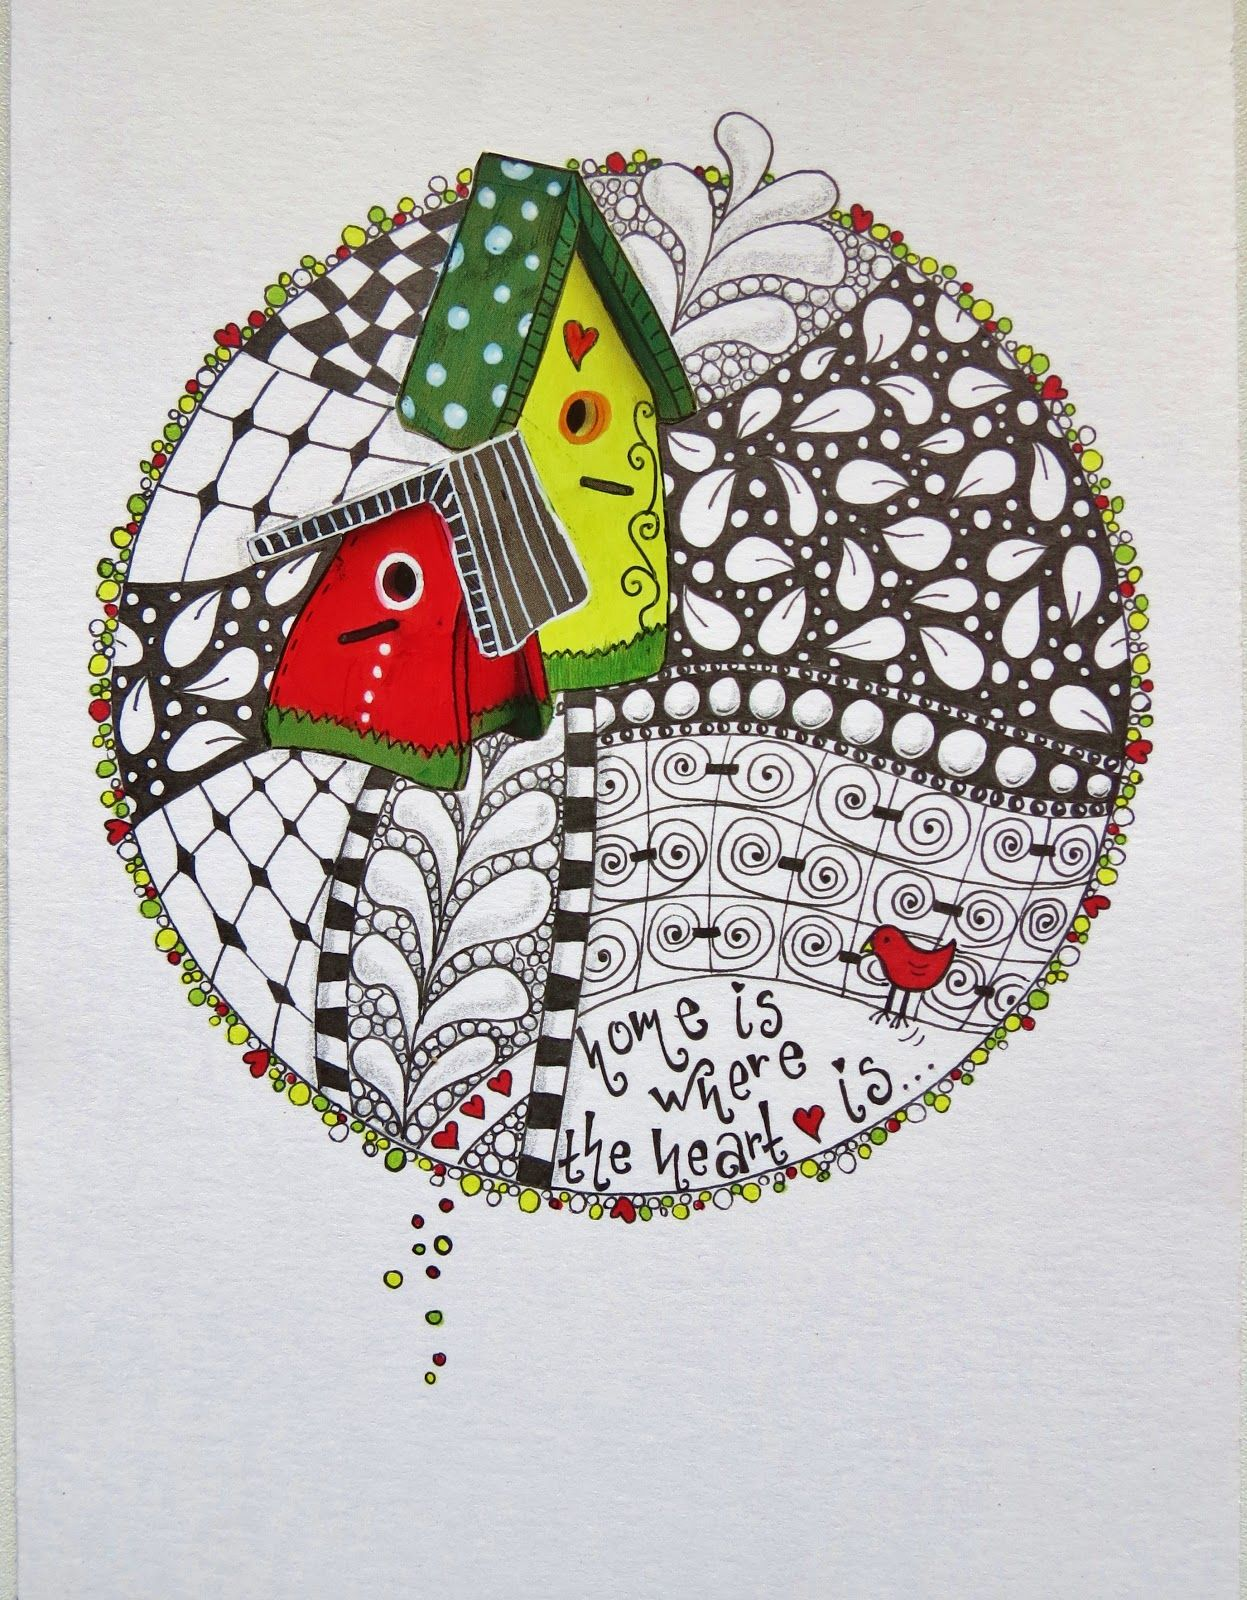 zendala - Home is Where the Heart Is